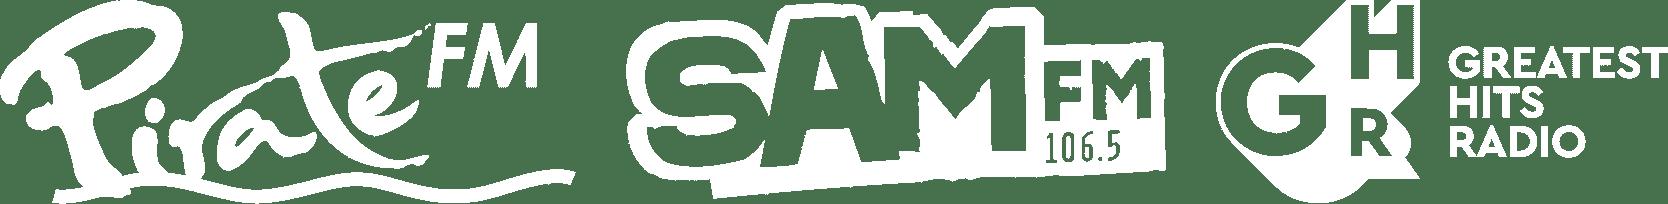 Pirate FM, SAM FM, Greatest Hits Radio